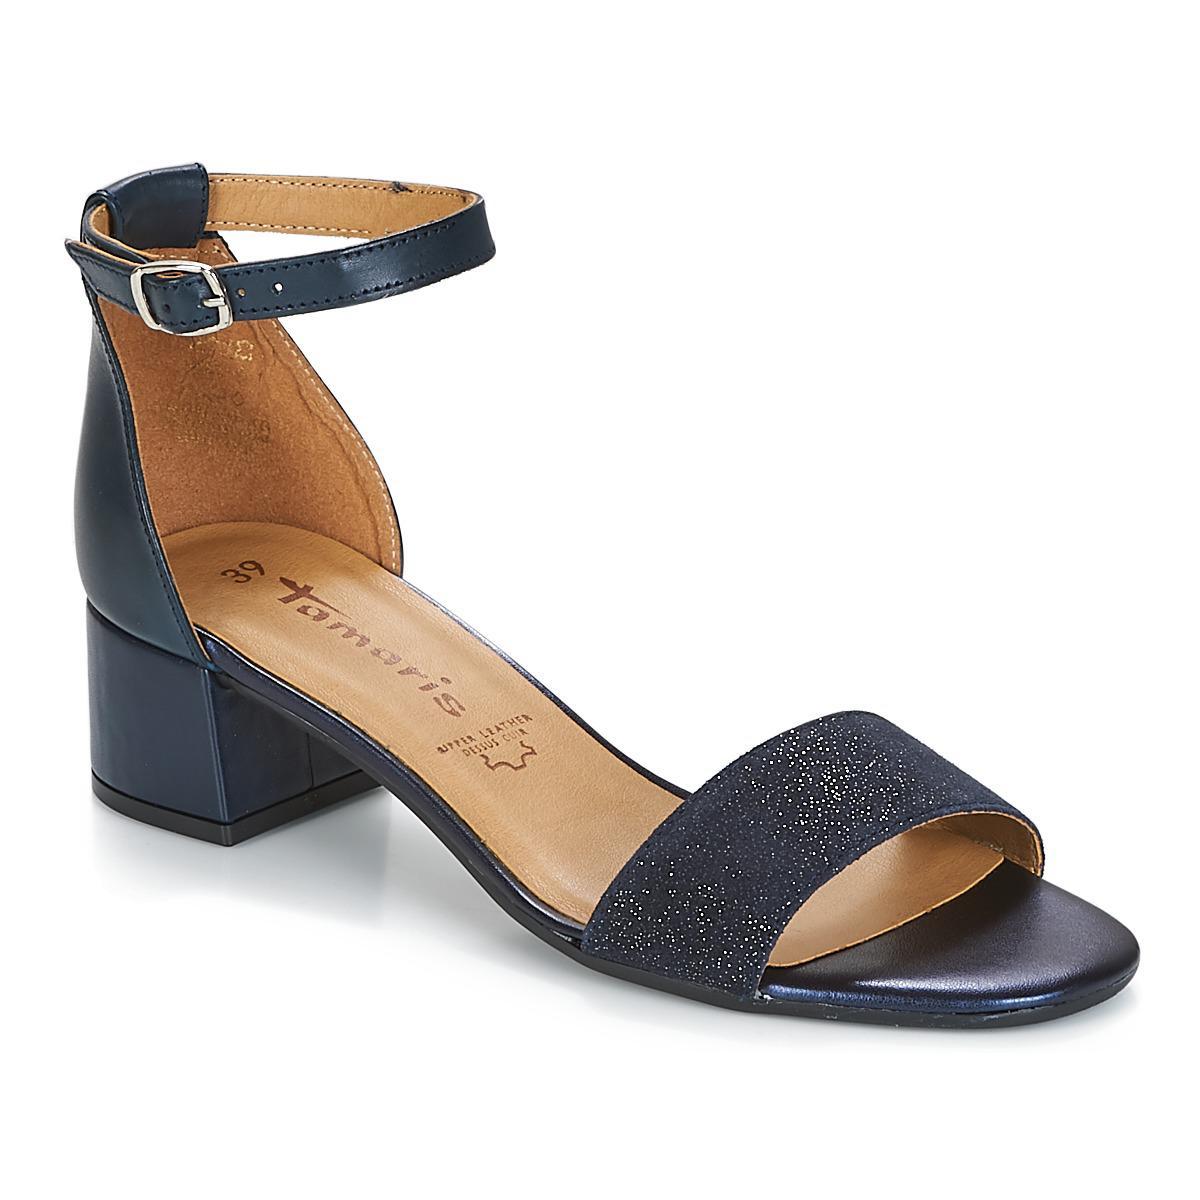 Tamaris TICIPA women's Sandals in Ebay Online Free Shipping Purchase 6oaUhIOzb